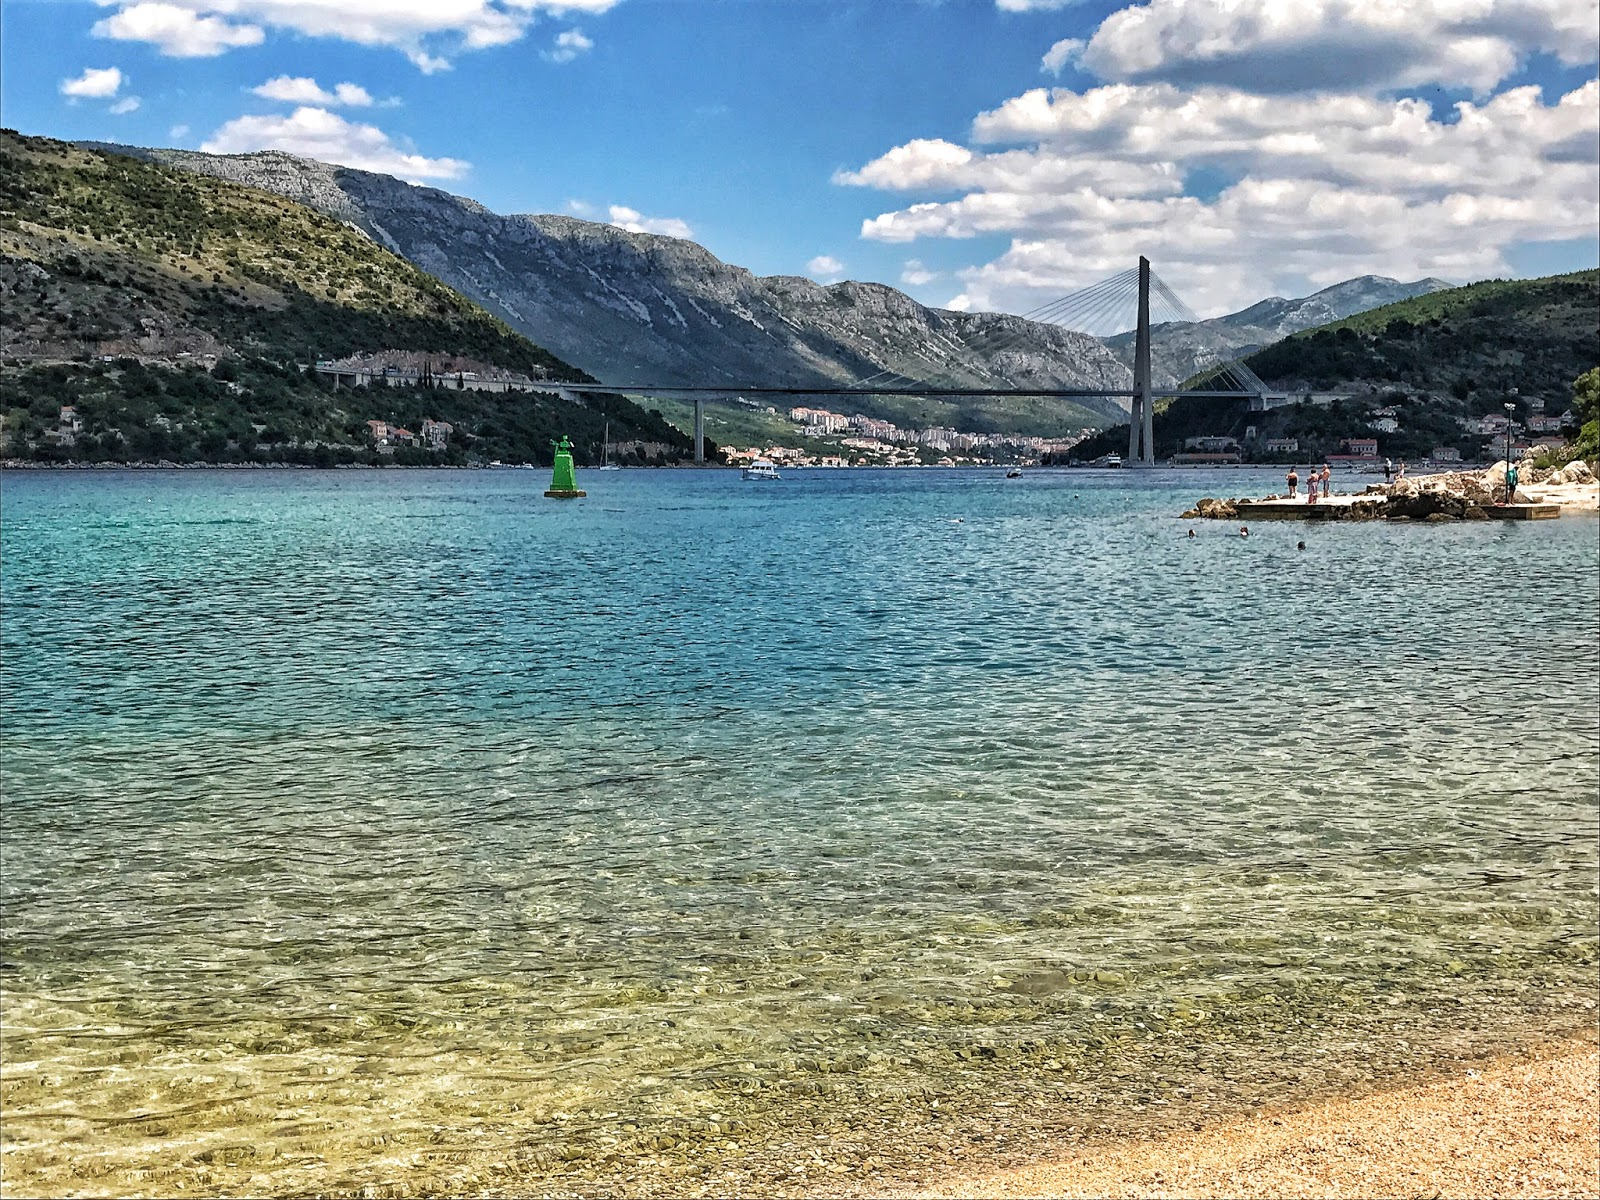 beautiful beach and sea views at Copacabana beach Dubrovnik Croatia